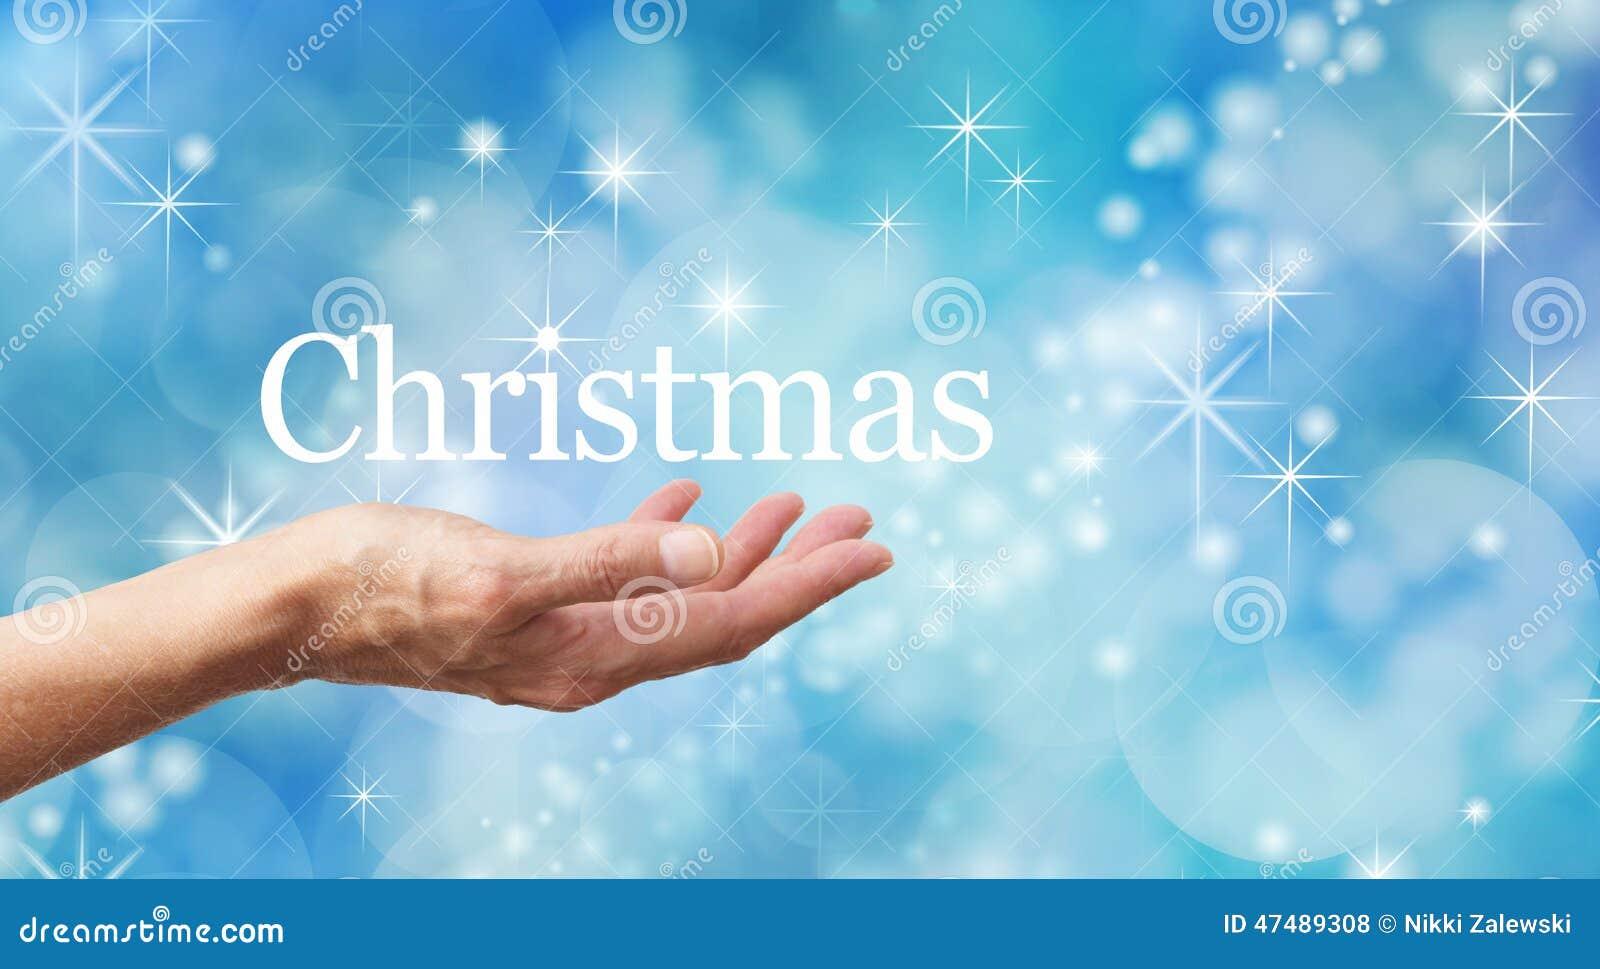 Koele Blauwe Fonkelende Kerstmisachtergrond